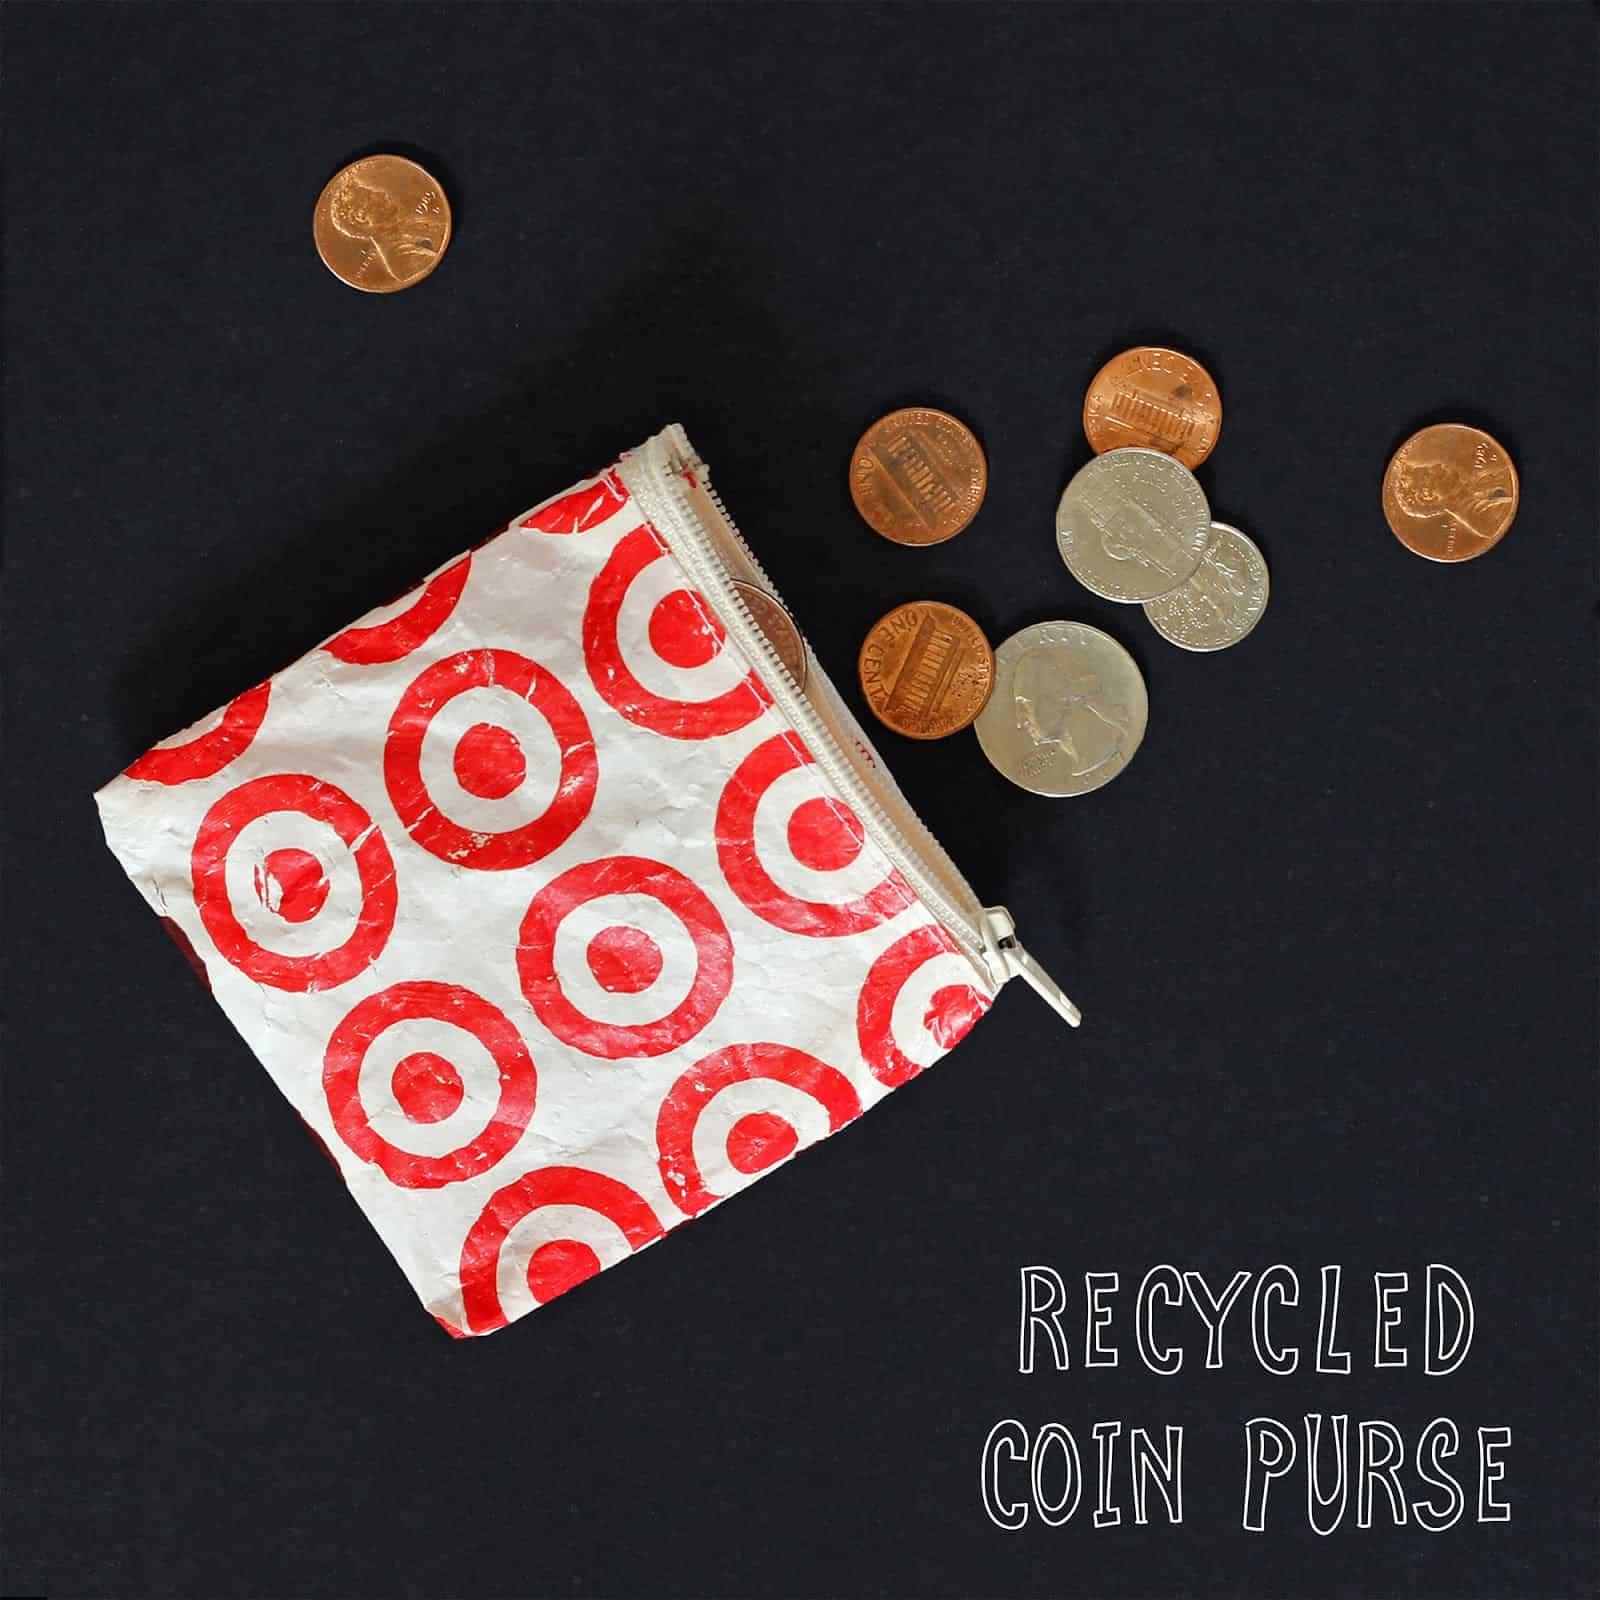 DIY plastic bag coin purse